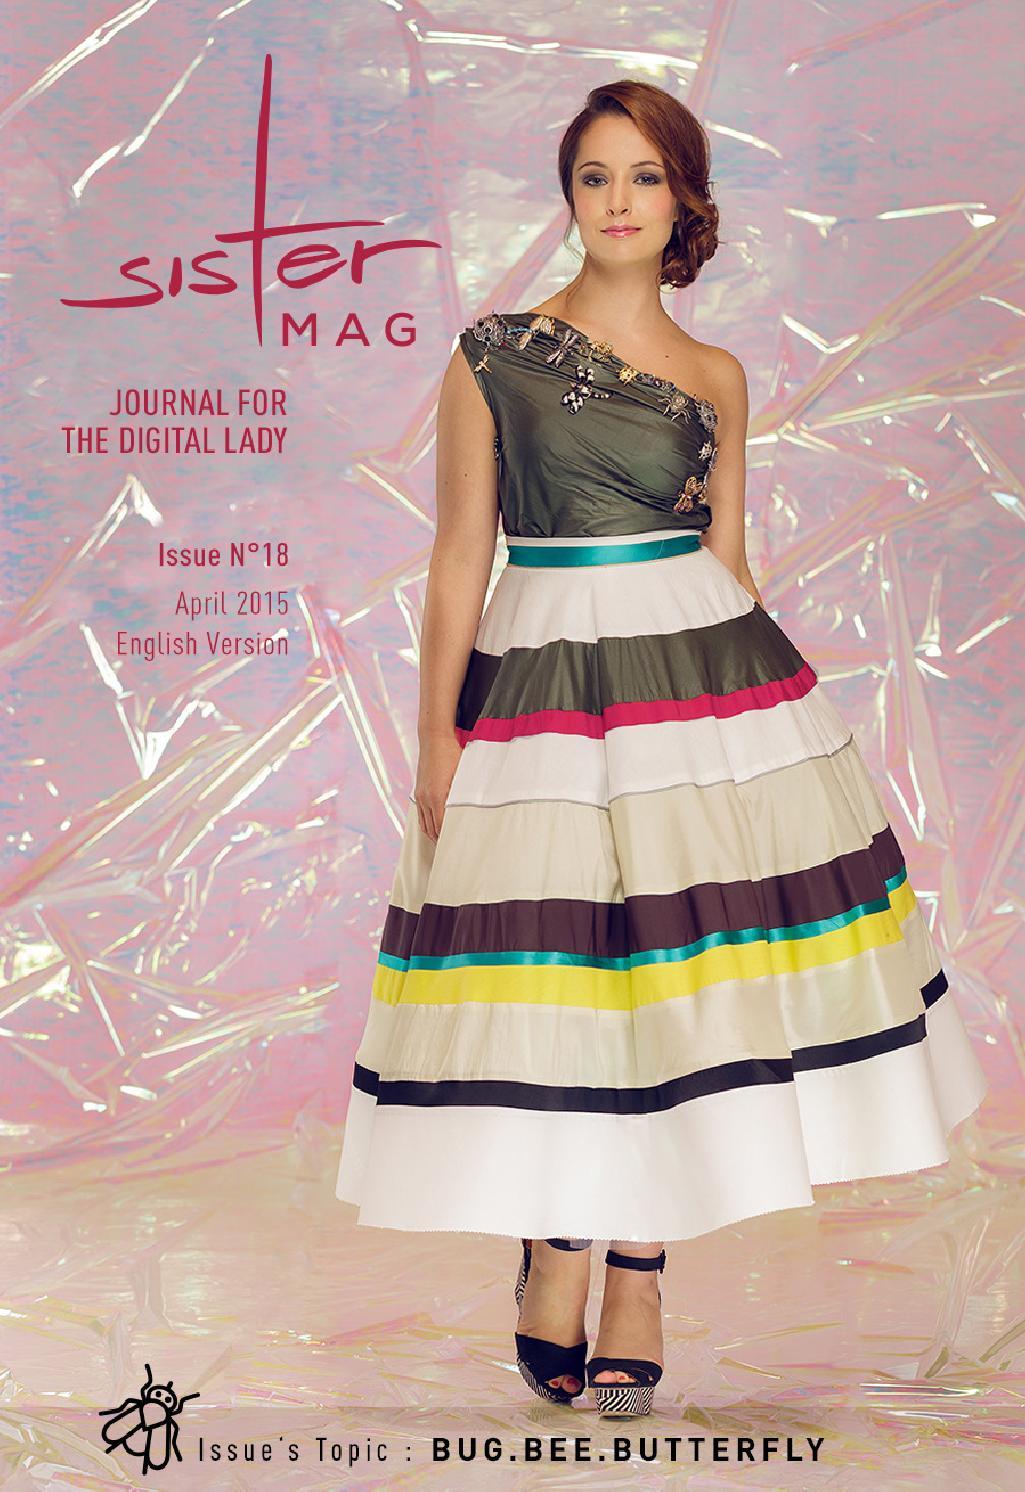 970ad72d82f sisterMAG Issue 18 by sisterMAG - issuu